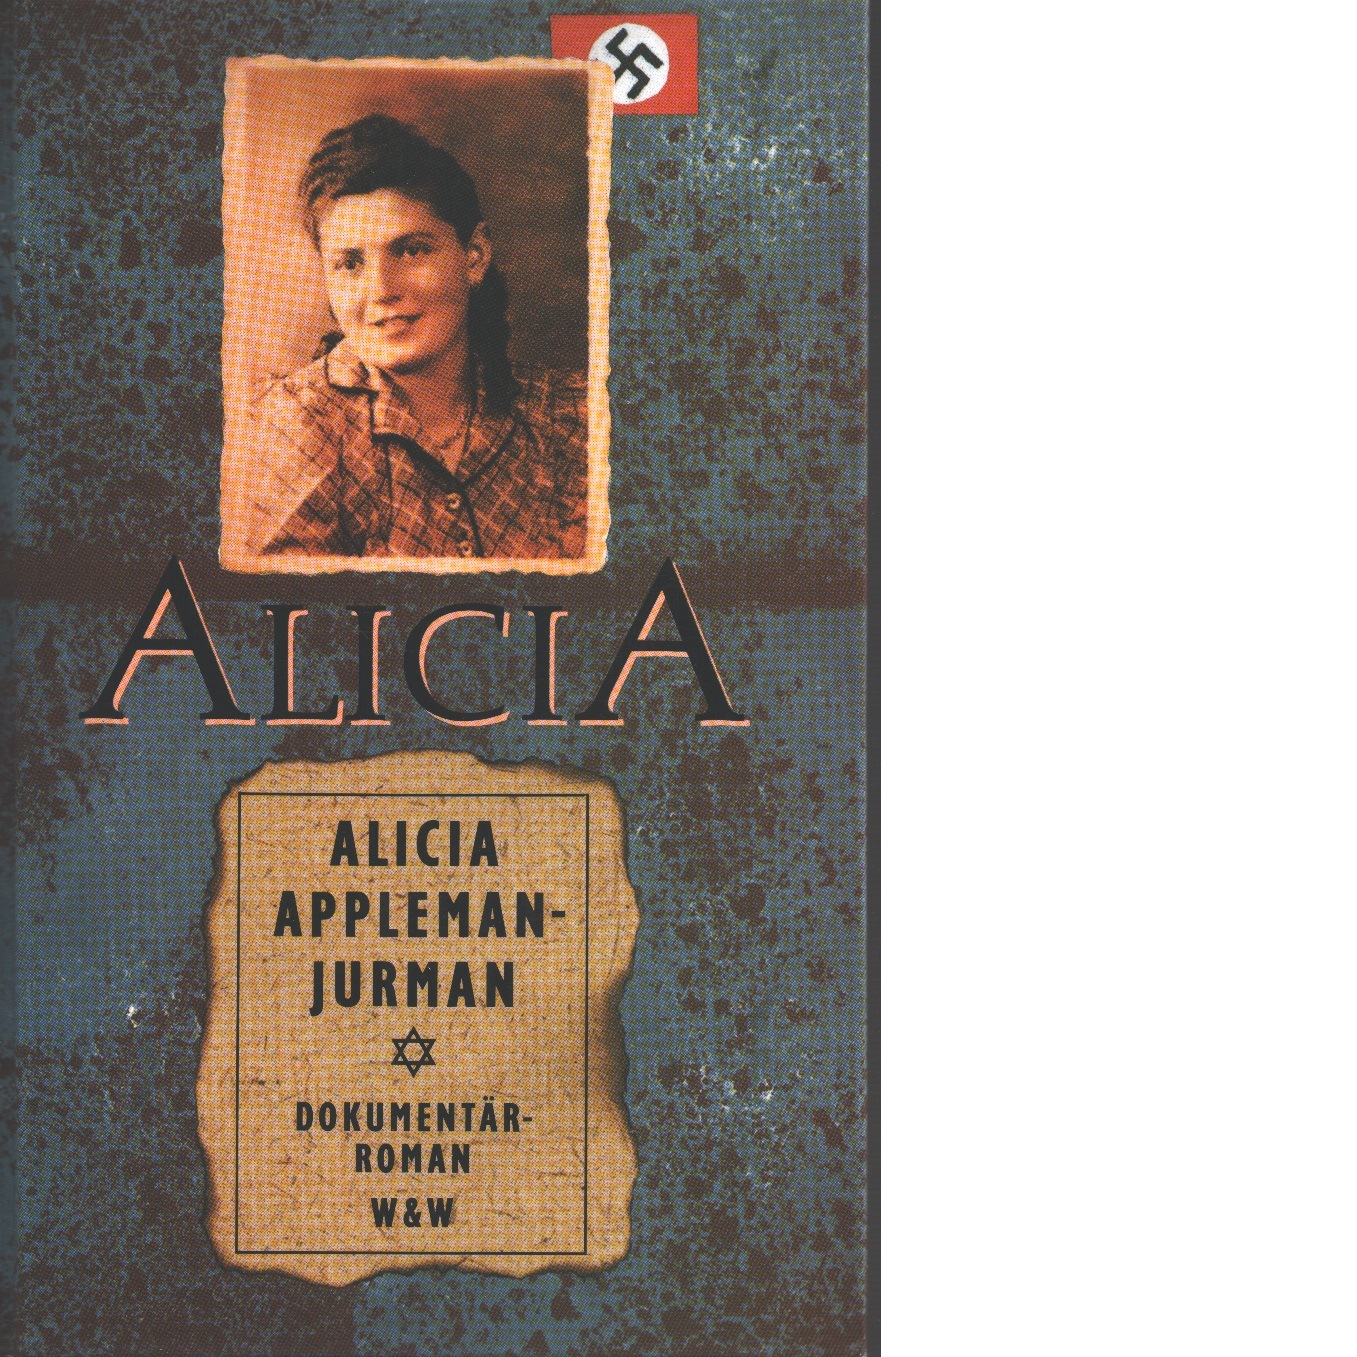 Alicia : min historia : [dokumentärroman] - Appleman-Jurman, Alicia